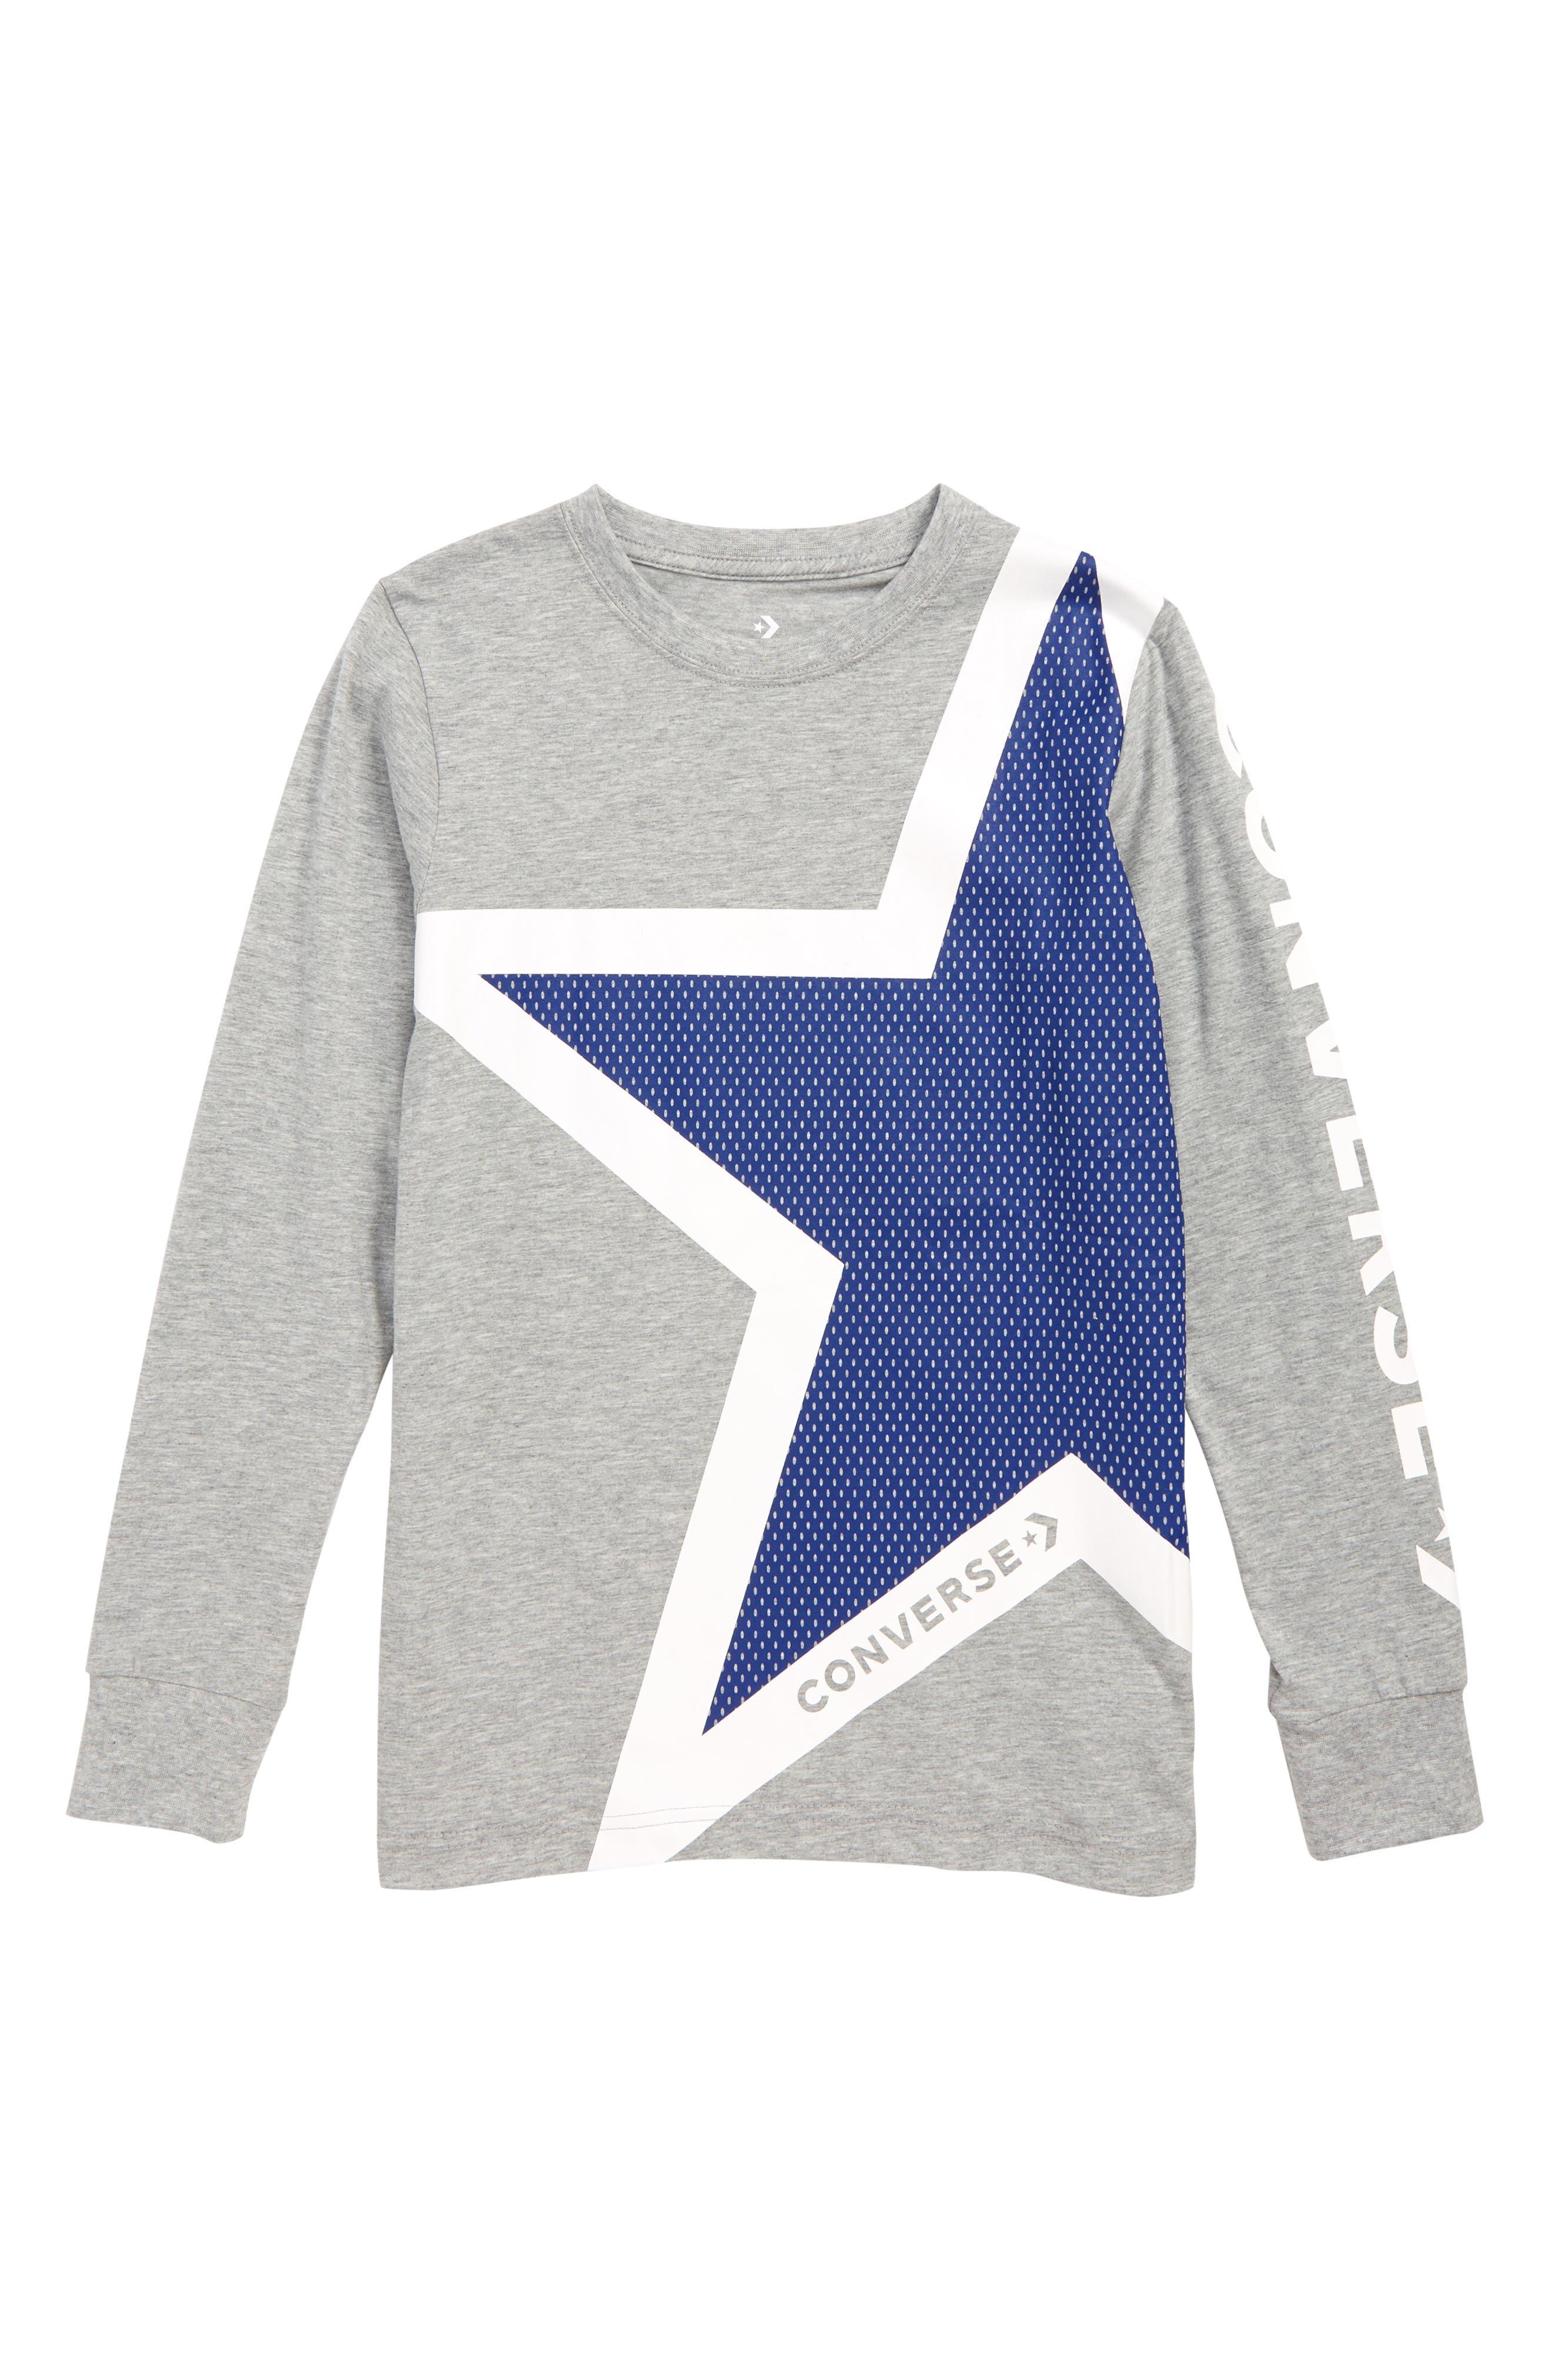 CONVERSE One Star T-Shirt, Main, color, DARK GREY HEATHER